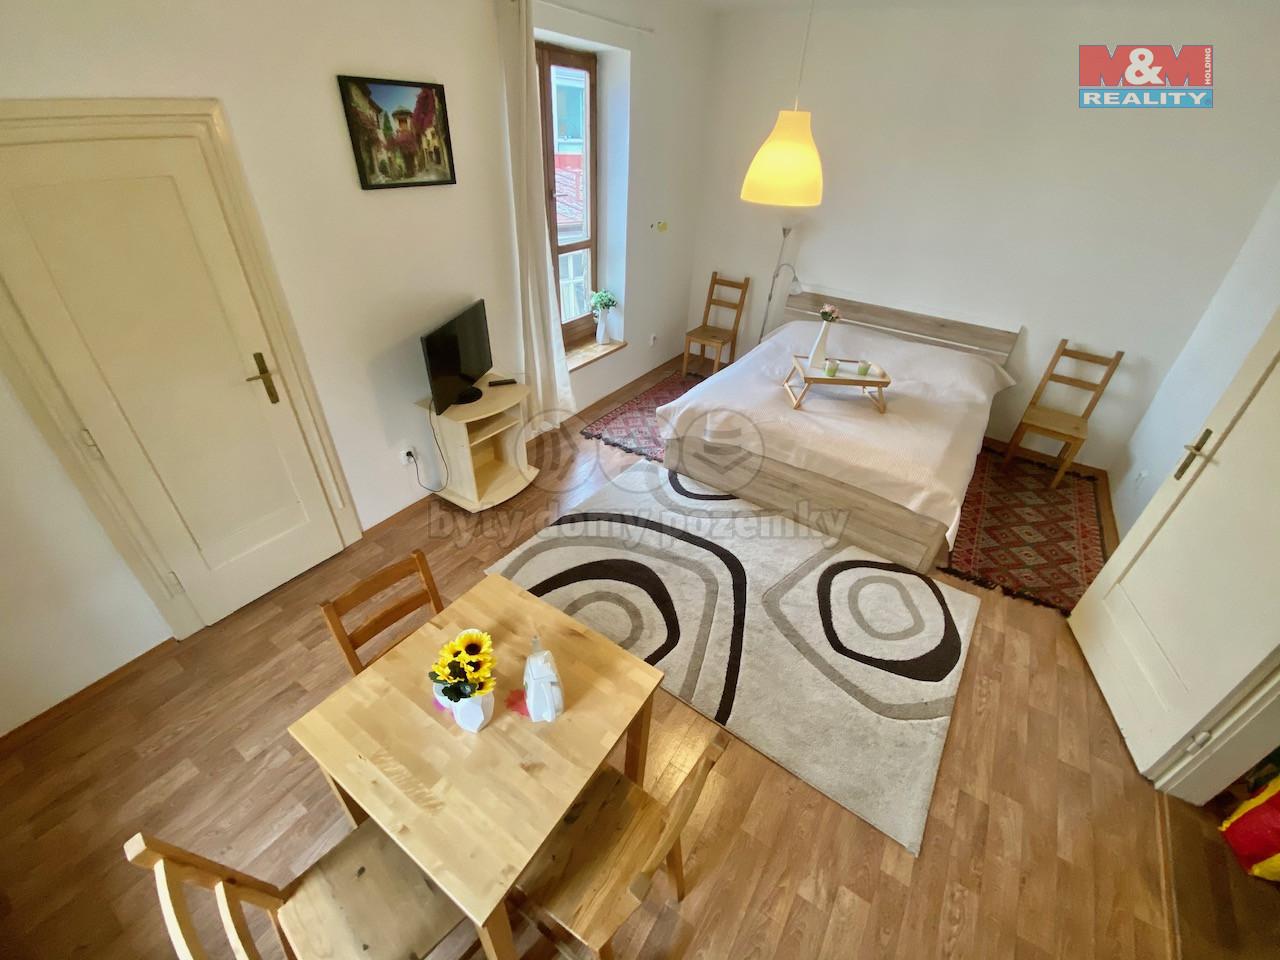 Pronájem bytu 2+1, 53 m², Praha, ul. Opletalova